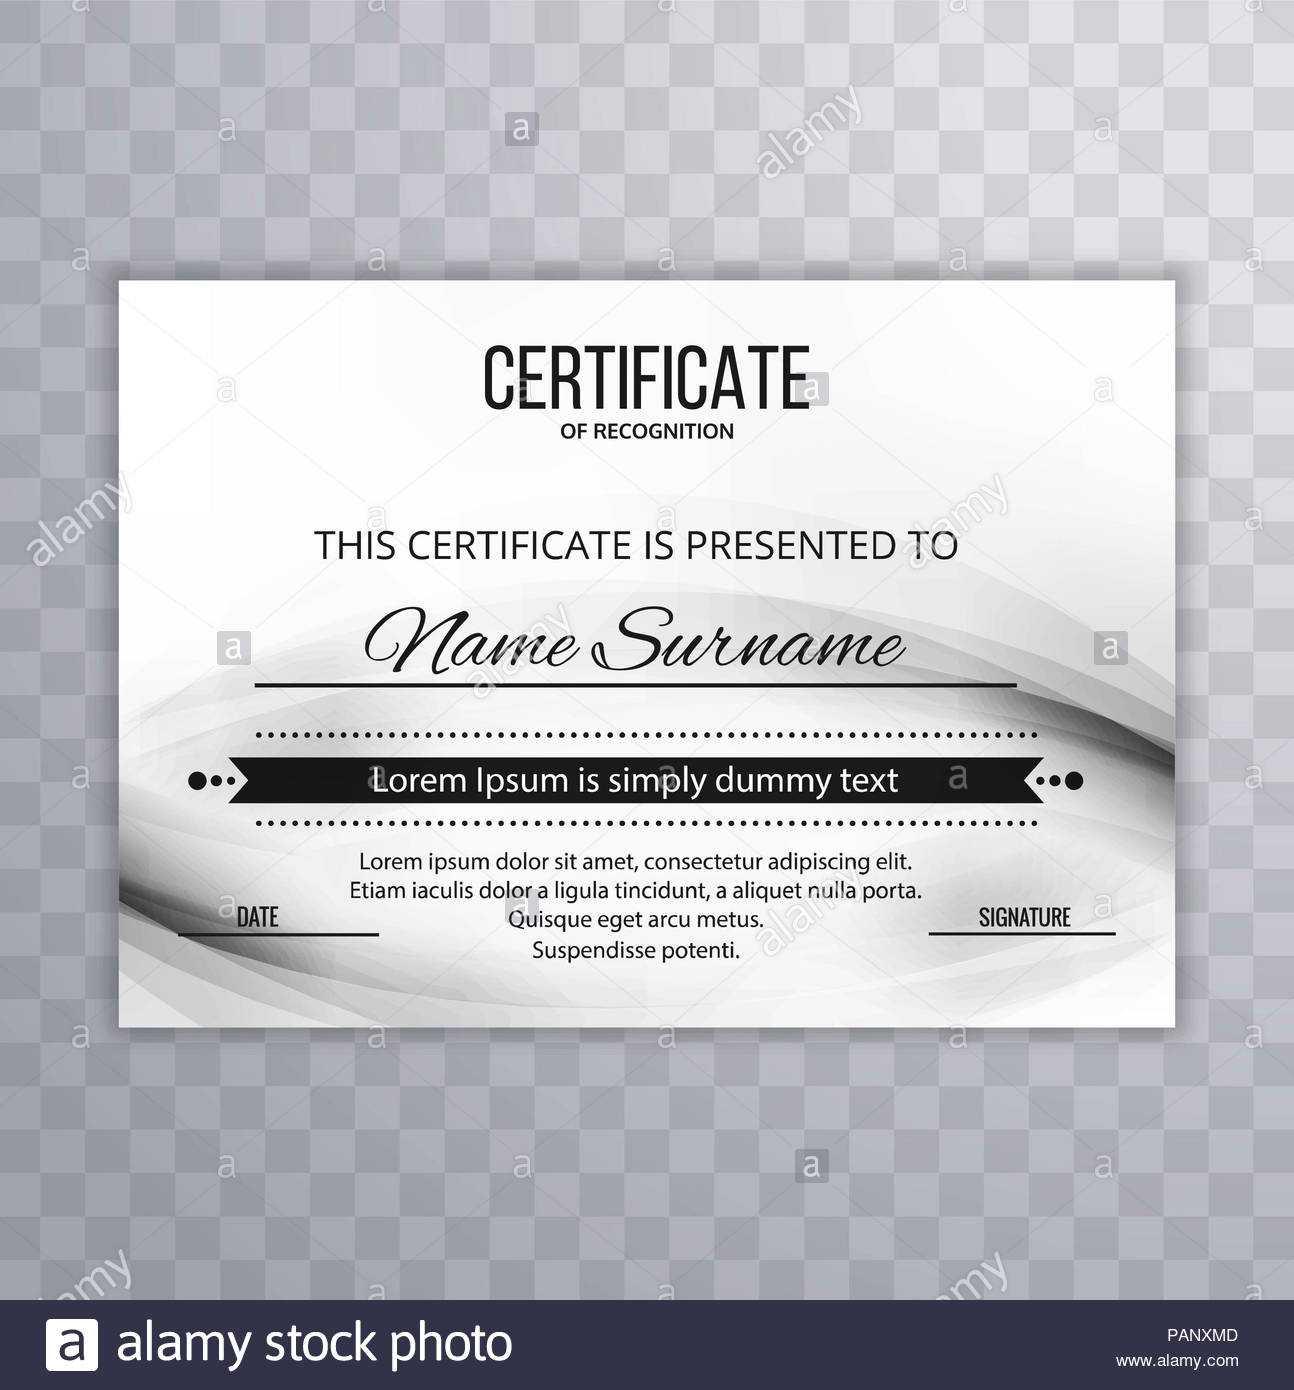 Modern Certificate Template Design Stock Photo: 213152925 Throughout Borderless Certificate Templates